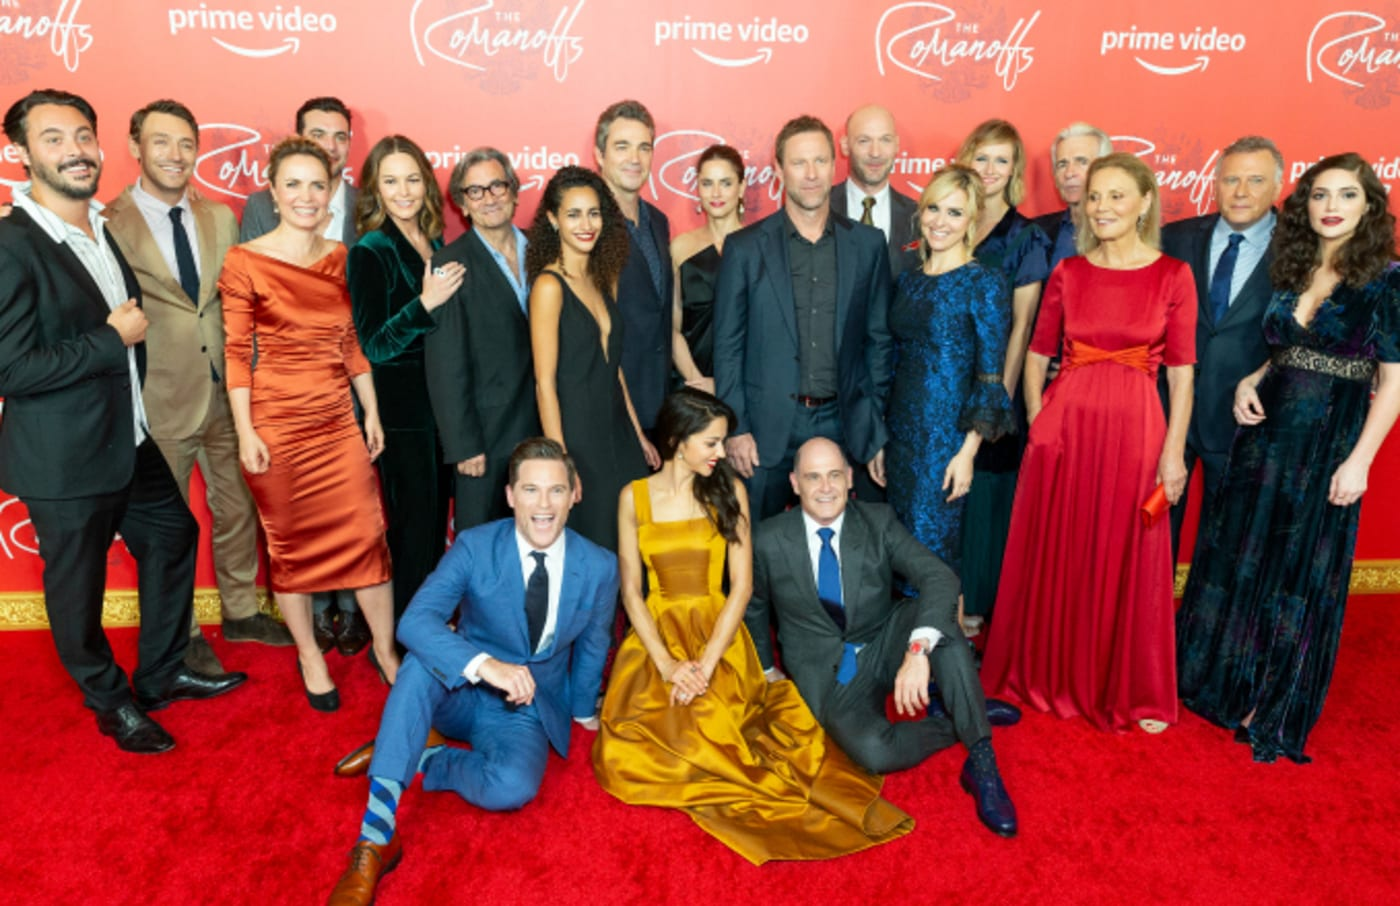 Cast attends Amazon Prime Premiere of The Romanoffs